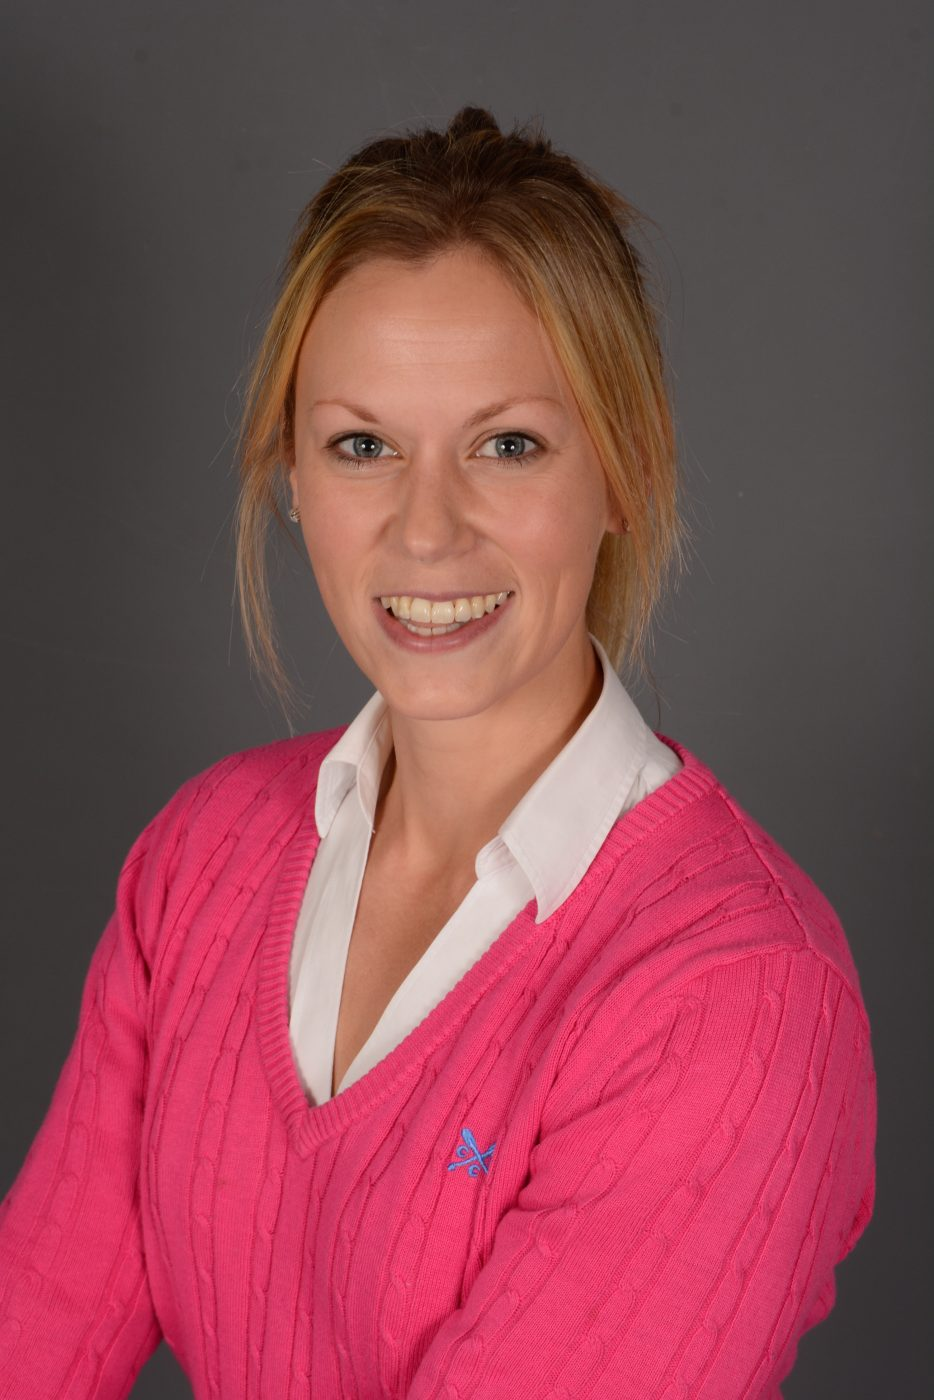 Rachel Marshall, BA (Hons), EYP